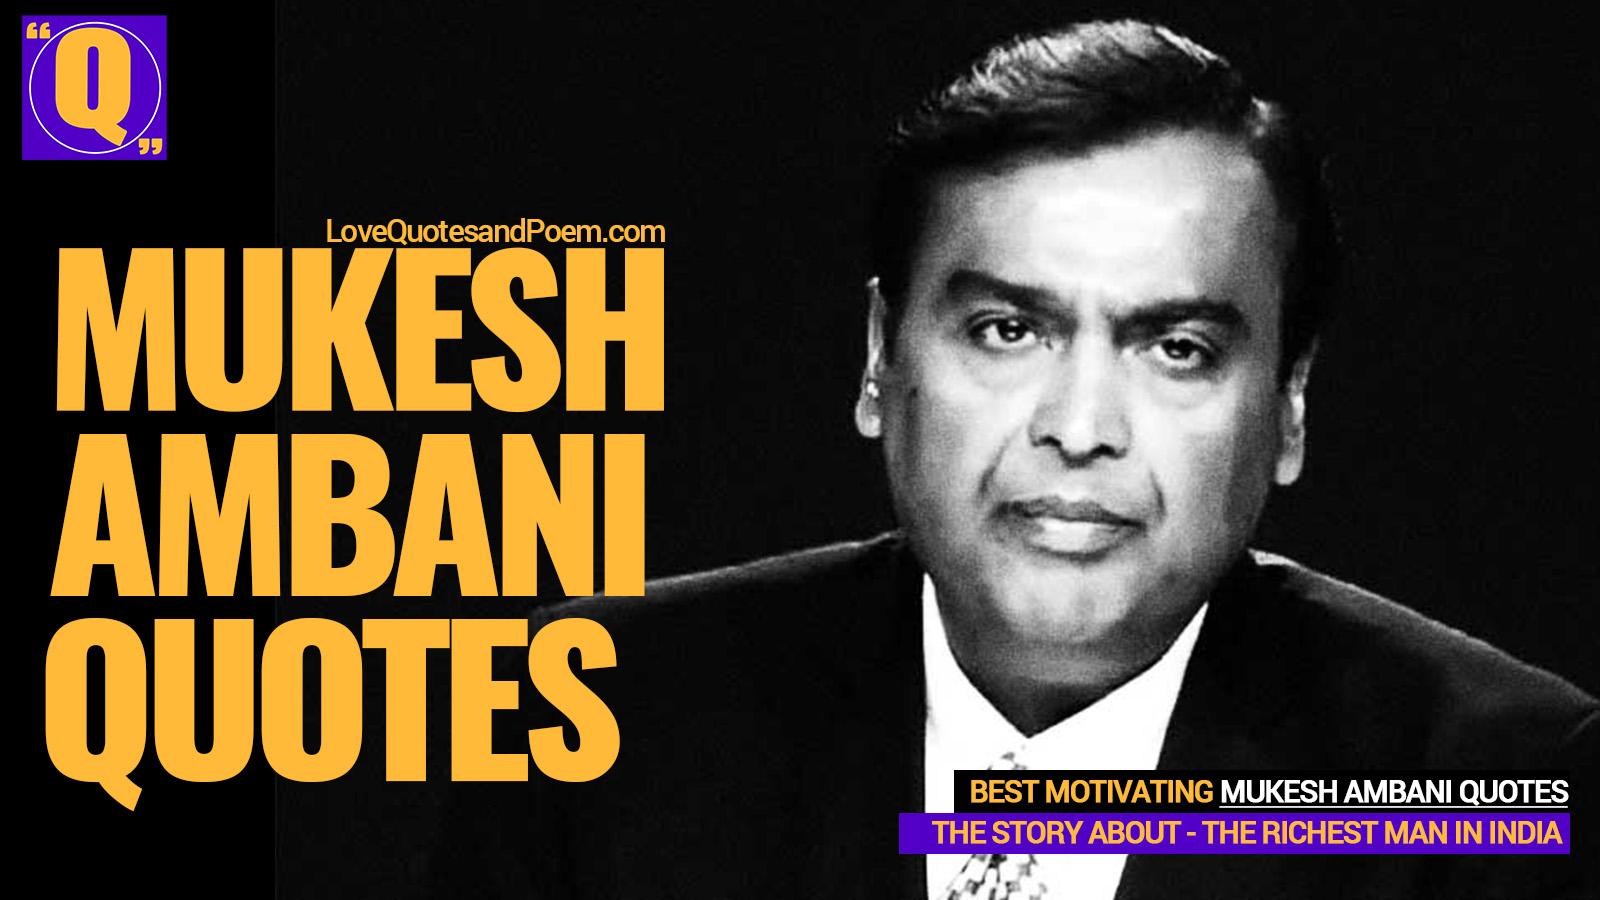 Mukesh-Ambani-Quotes